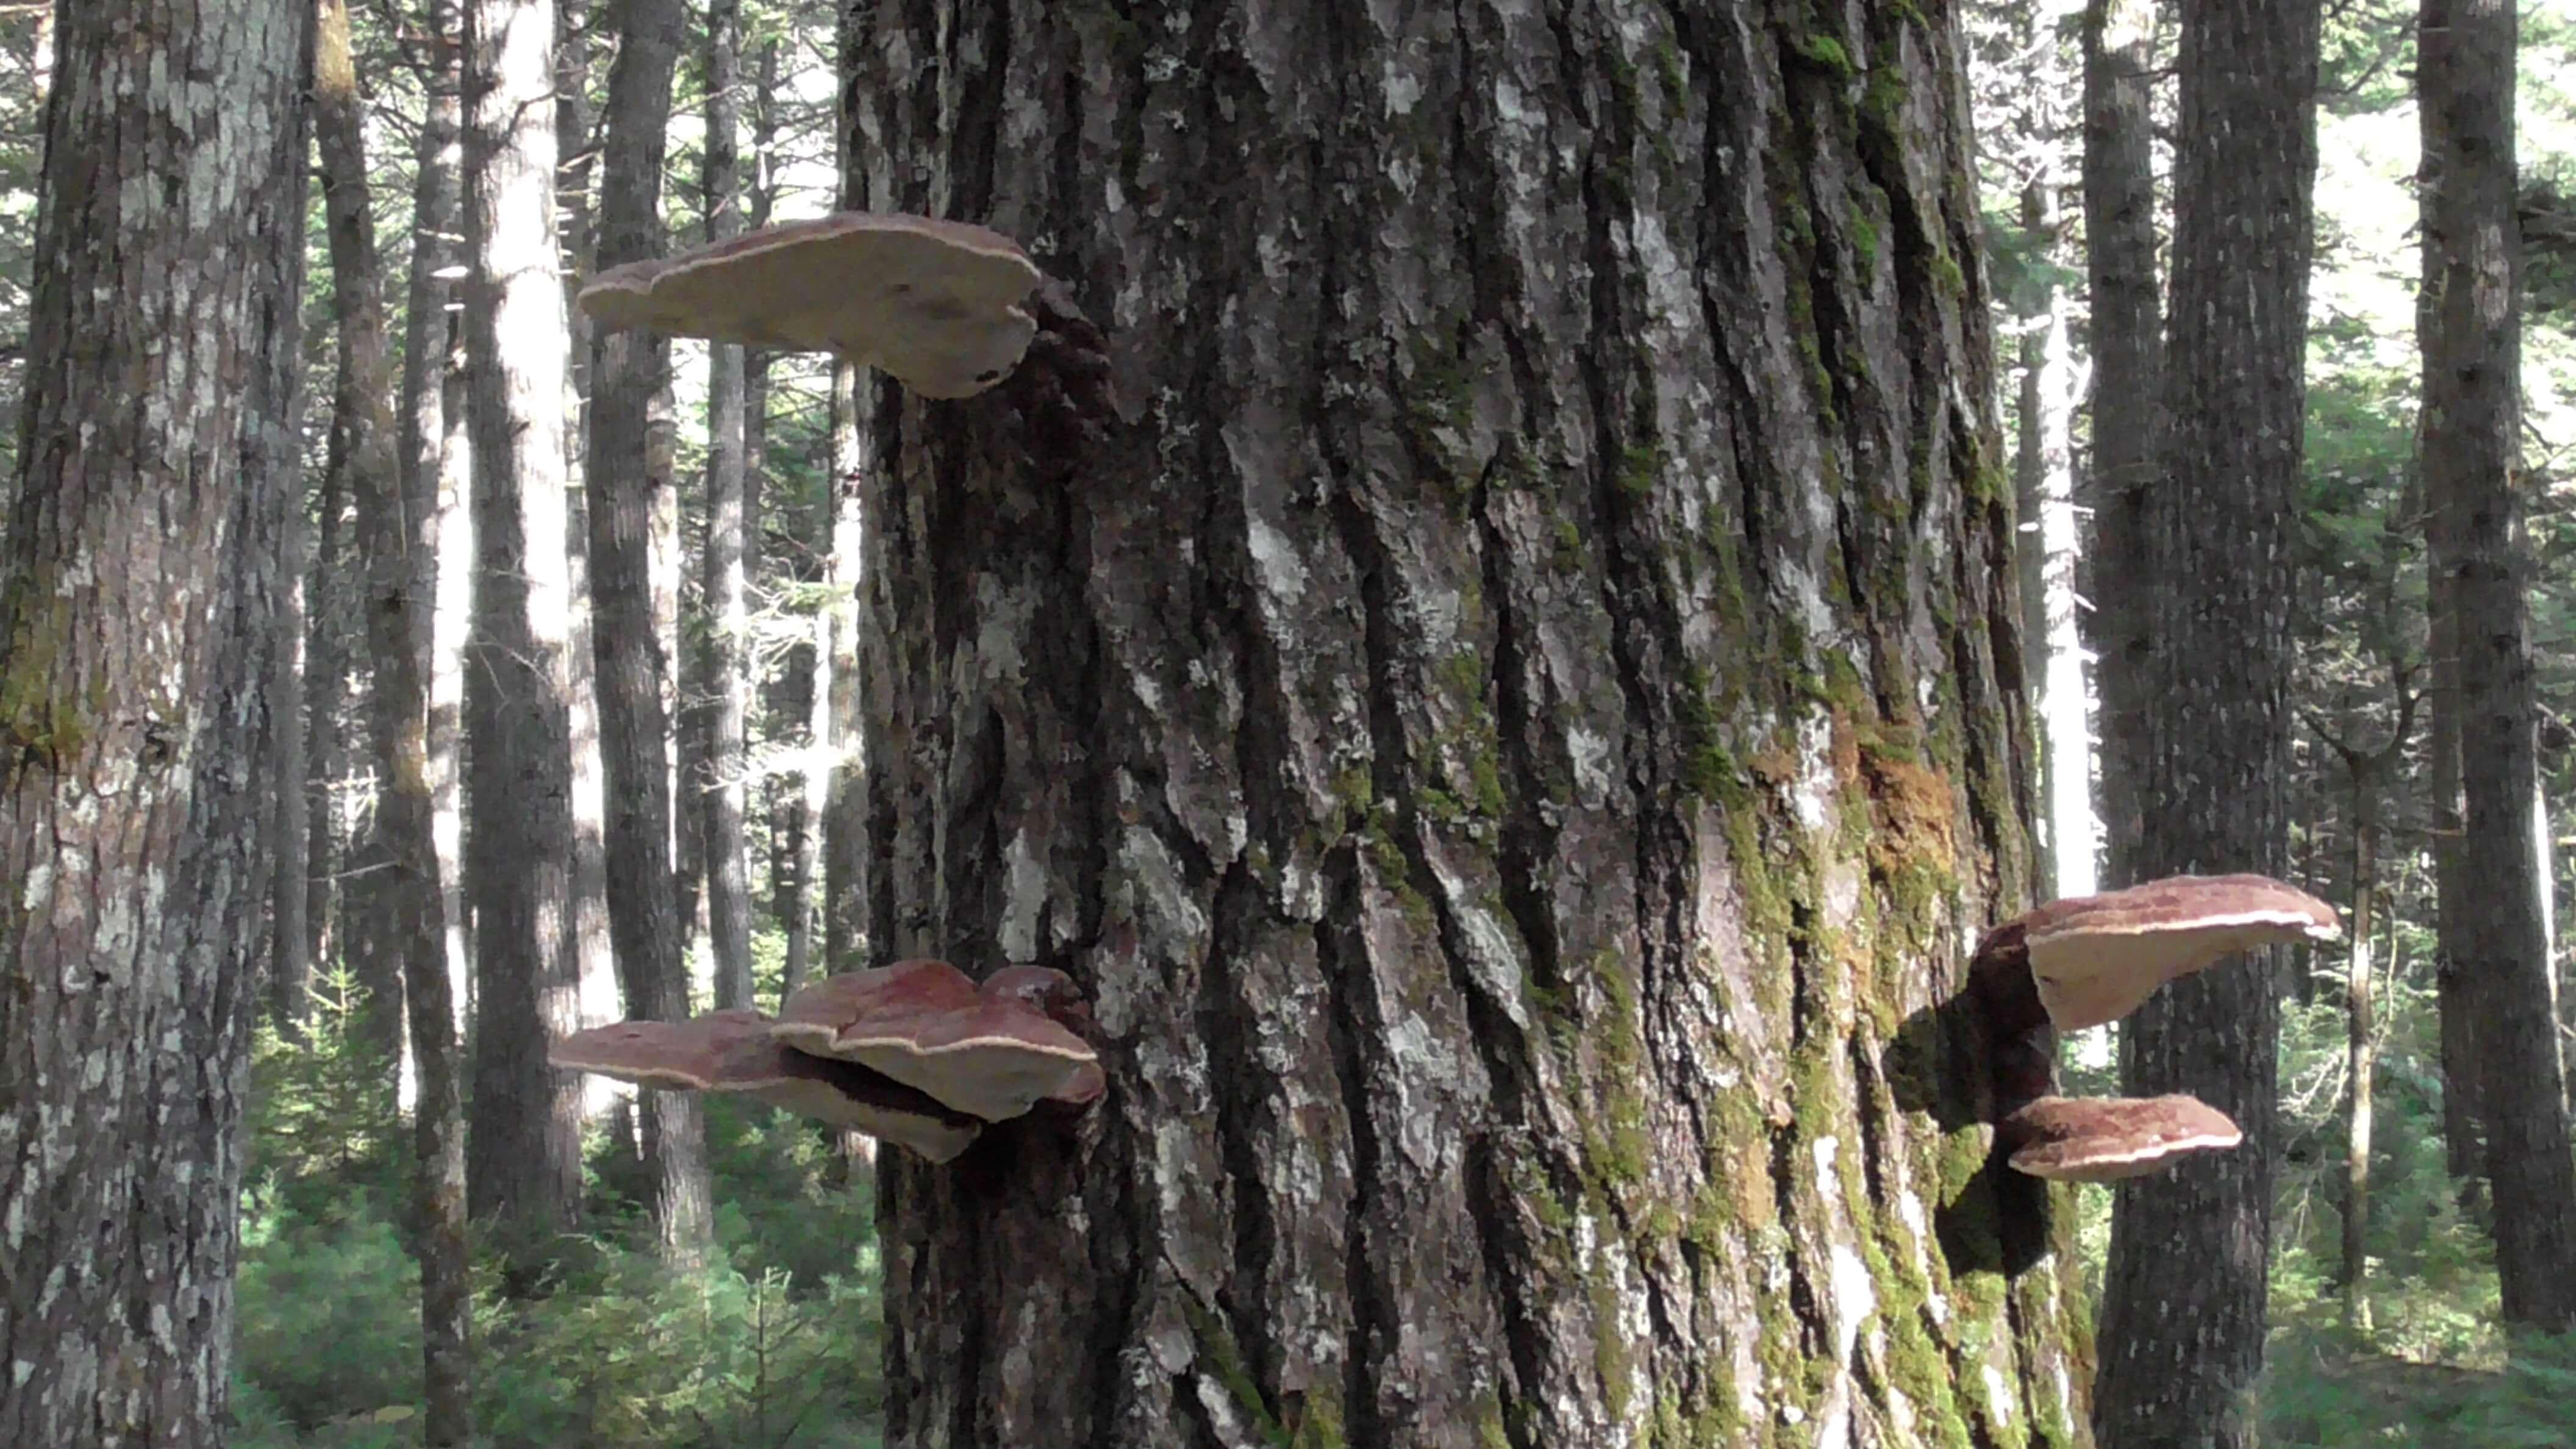 Old Growth Hemlock Forest, Kejimkujik National Park, Nova Scotia